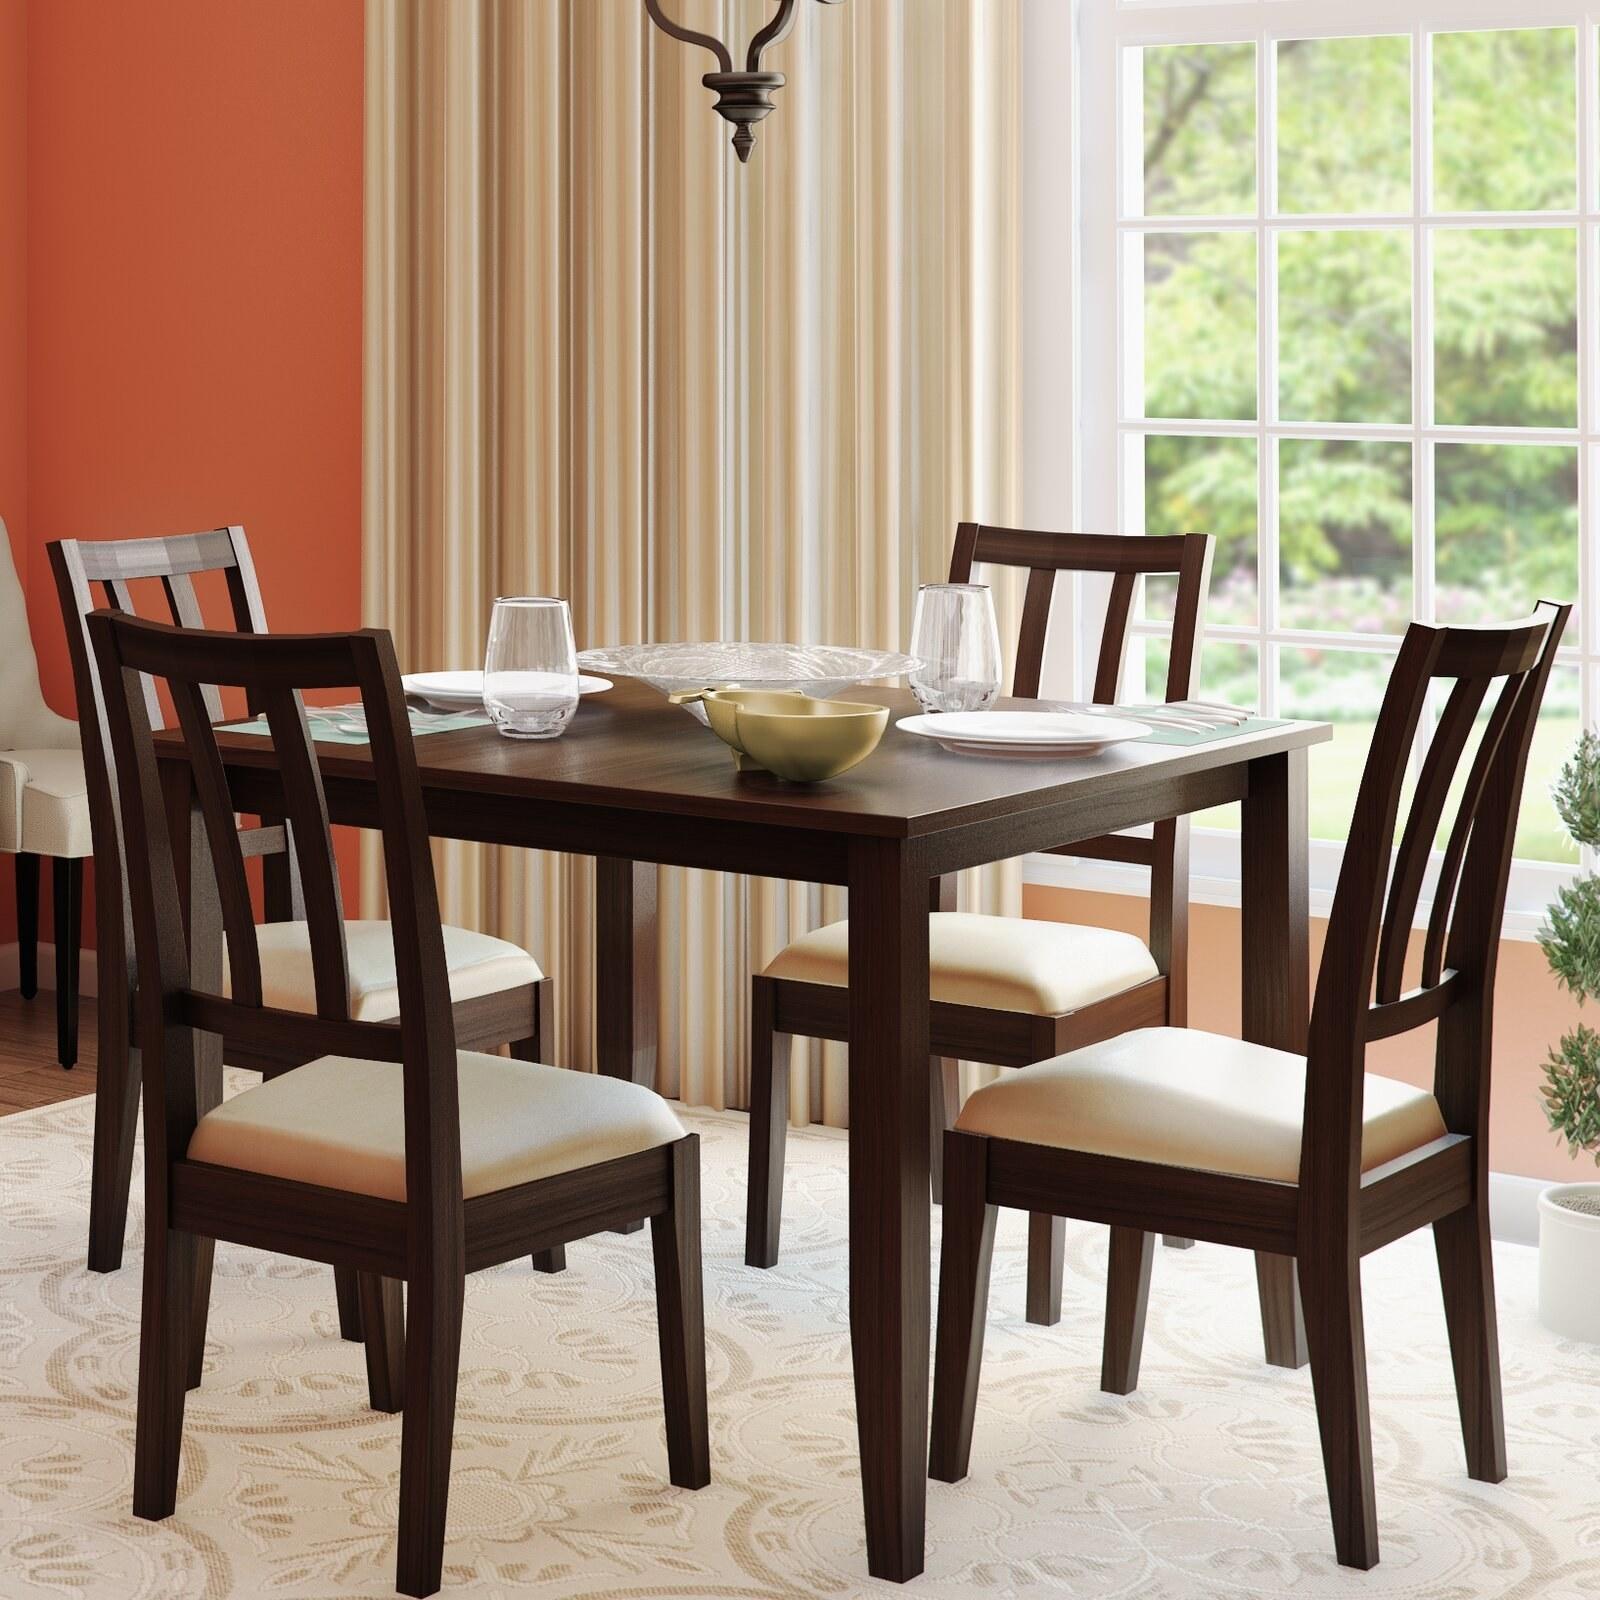 The dark wood dining set